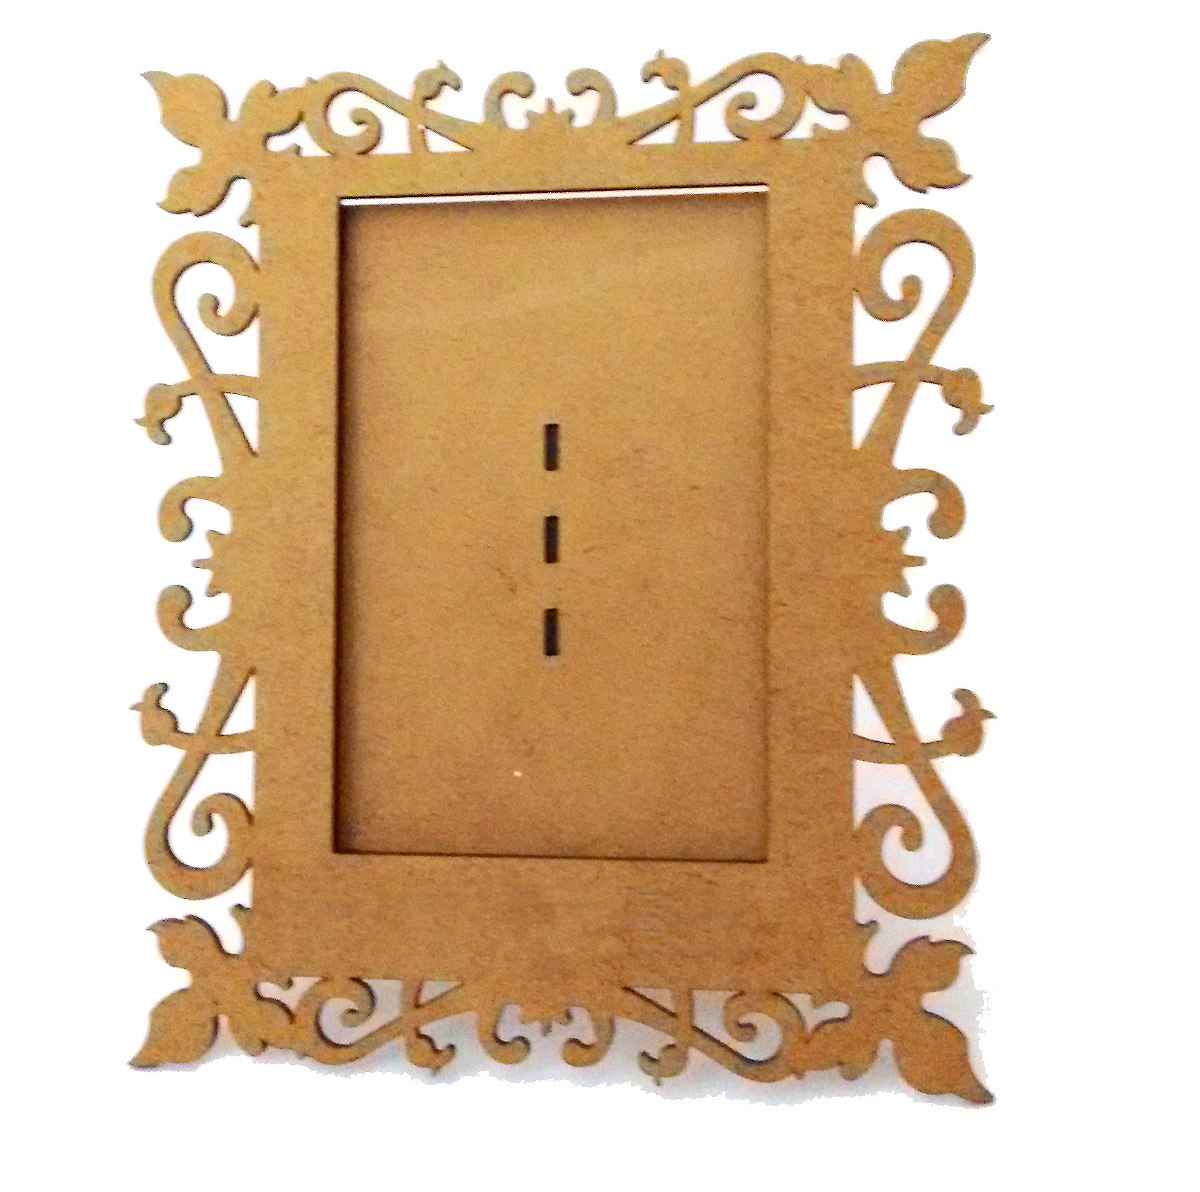 Porta Retrato Kit Com 5 Mdf Crú Corte Laser 10x15 R$ 50 00 no  #431708 1200x1192